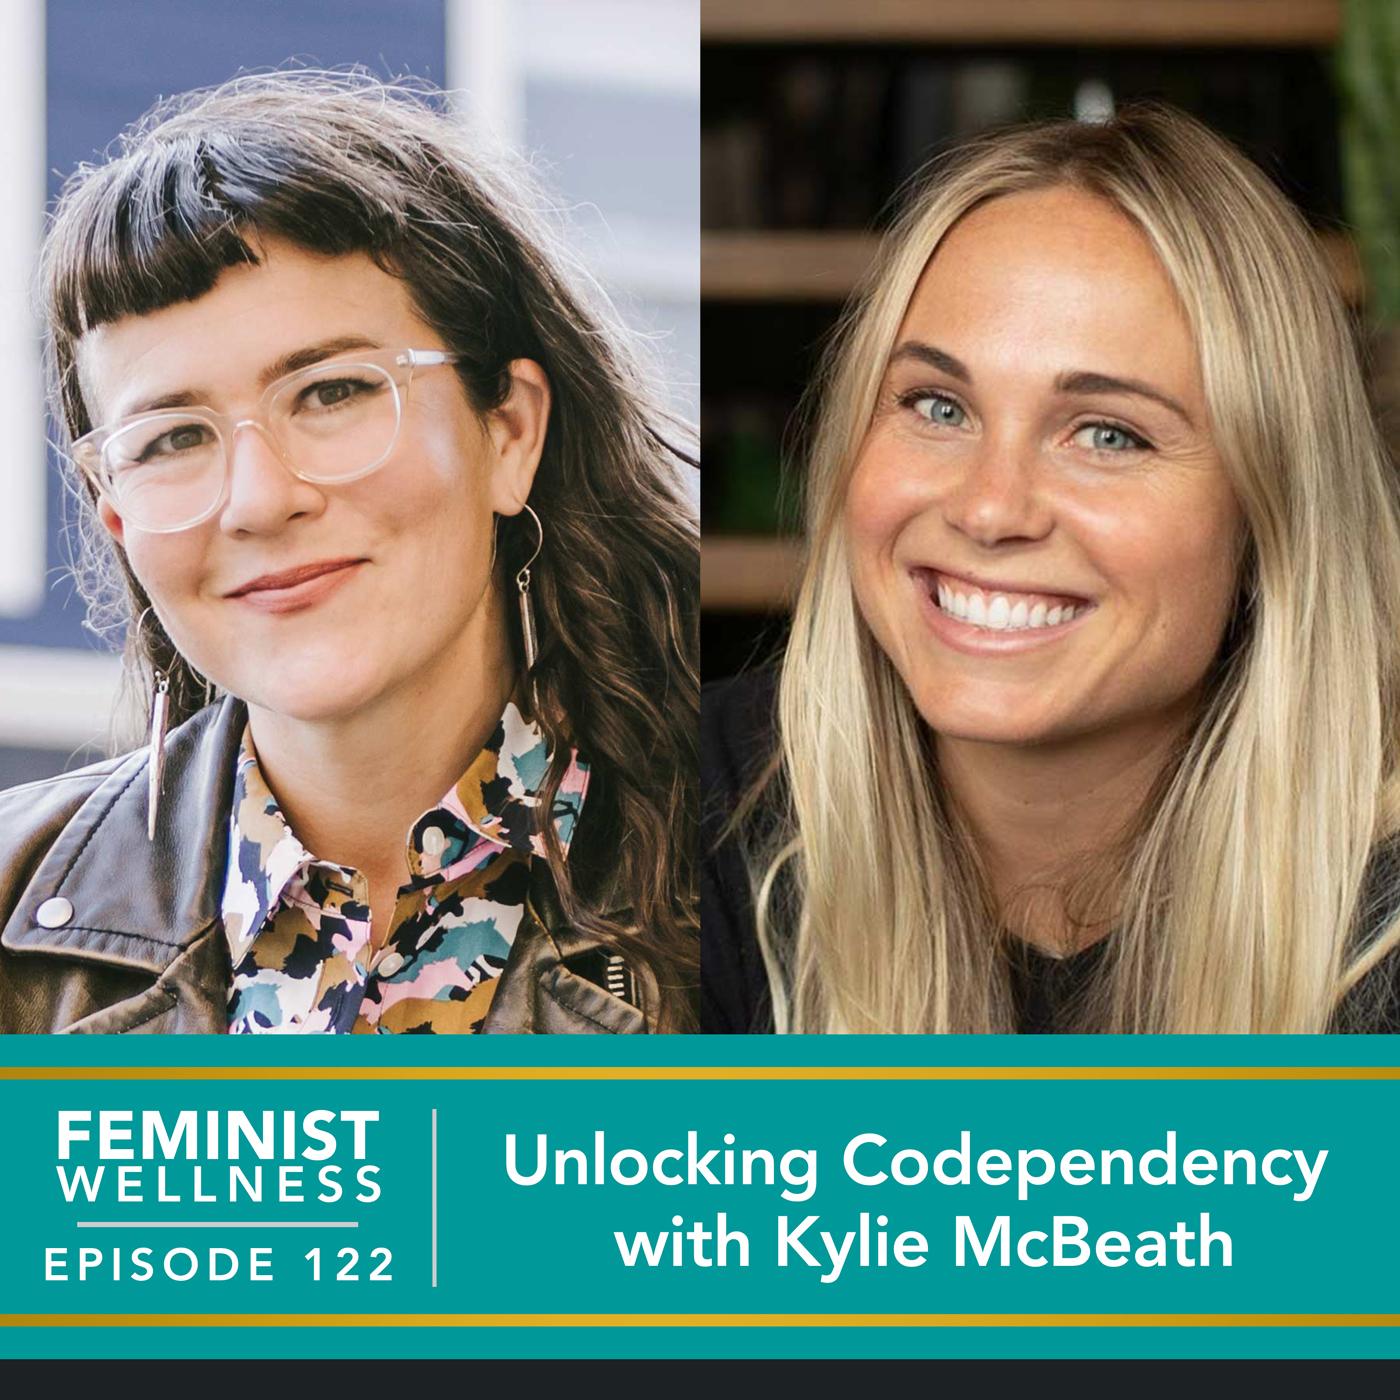 Feminist Wellness with Victoria Albina   Unlocking Codependency with Kylie McBeath